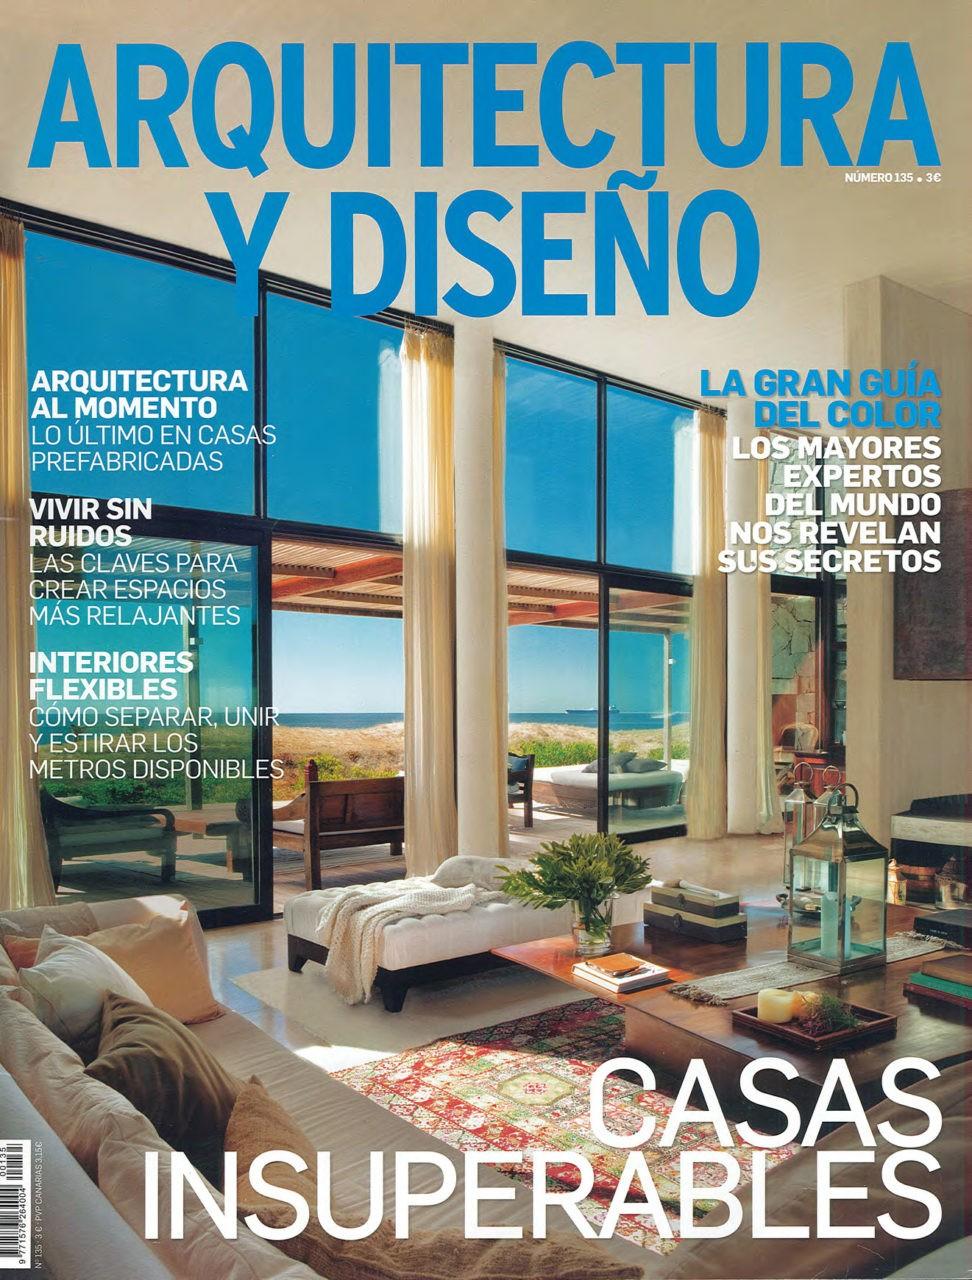 https://www.saota.com/wp-content/uploads/2018/01/2012_Issue_135_ArquitecturaYDiseno_SAOTA_Page_1.jpg